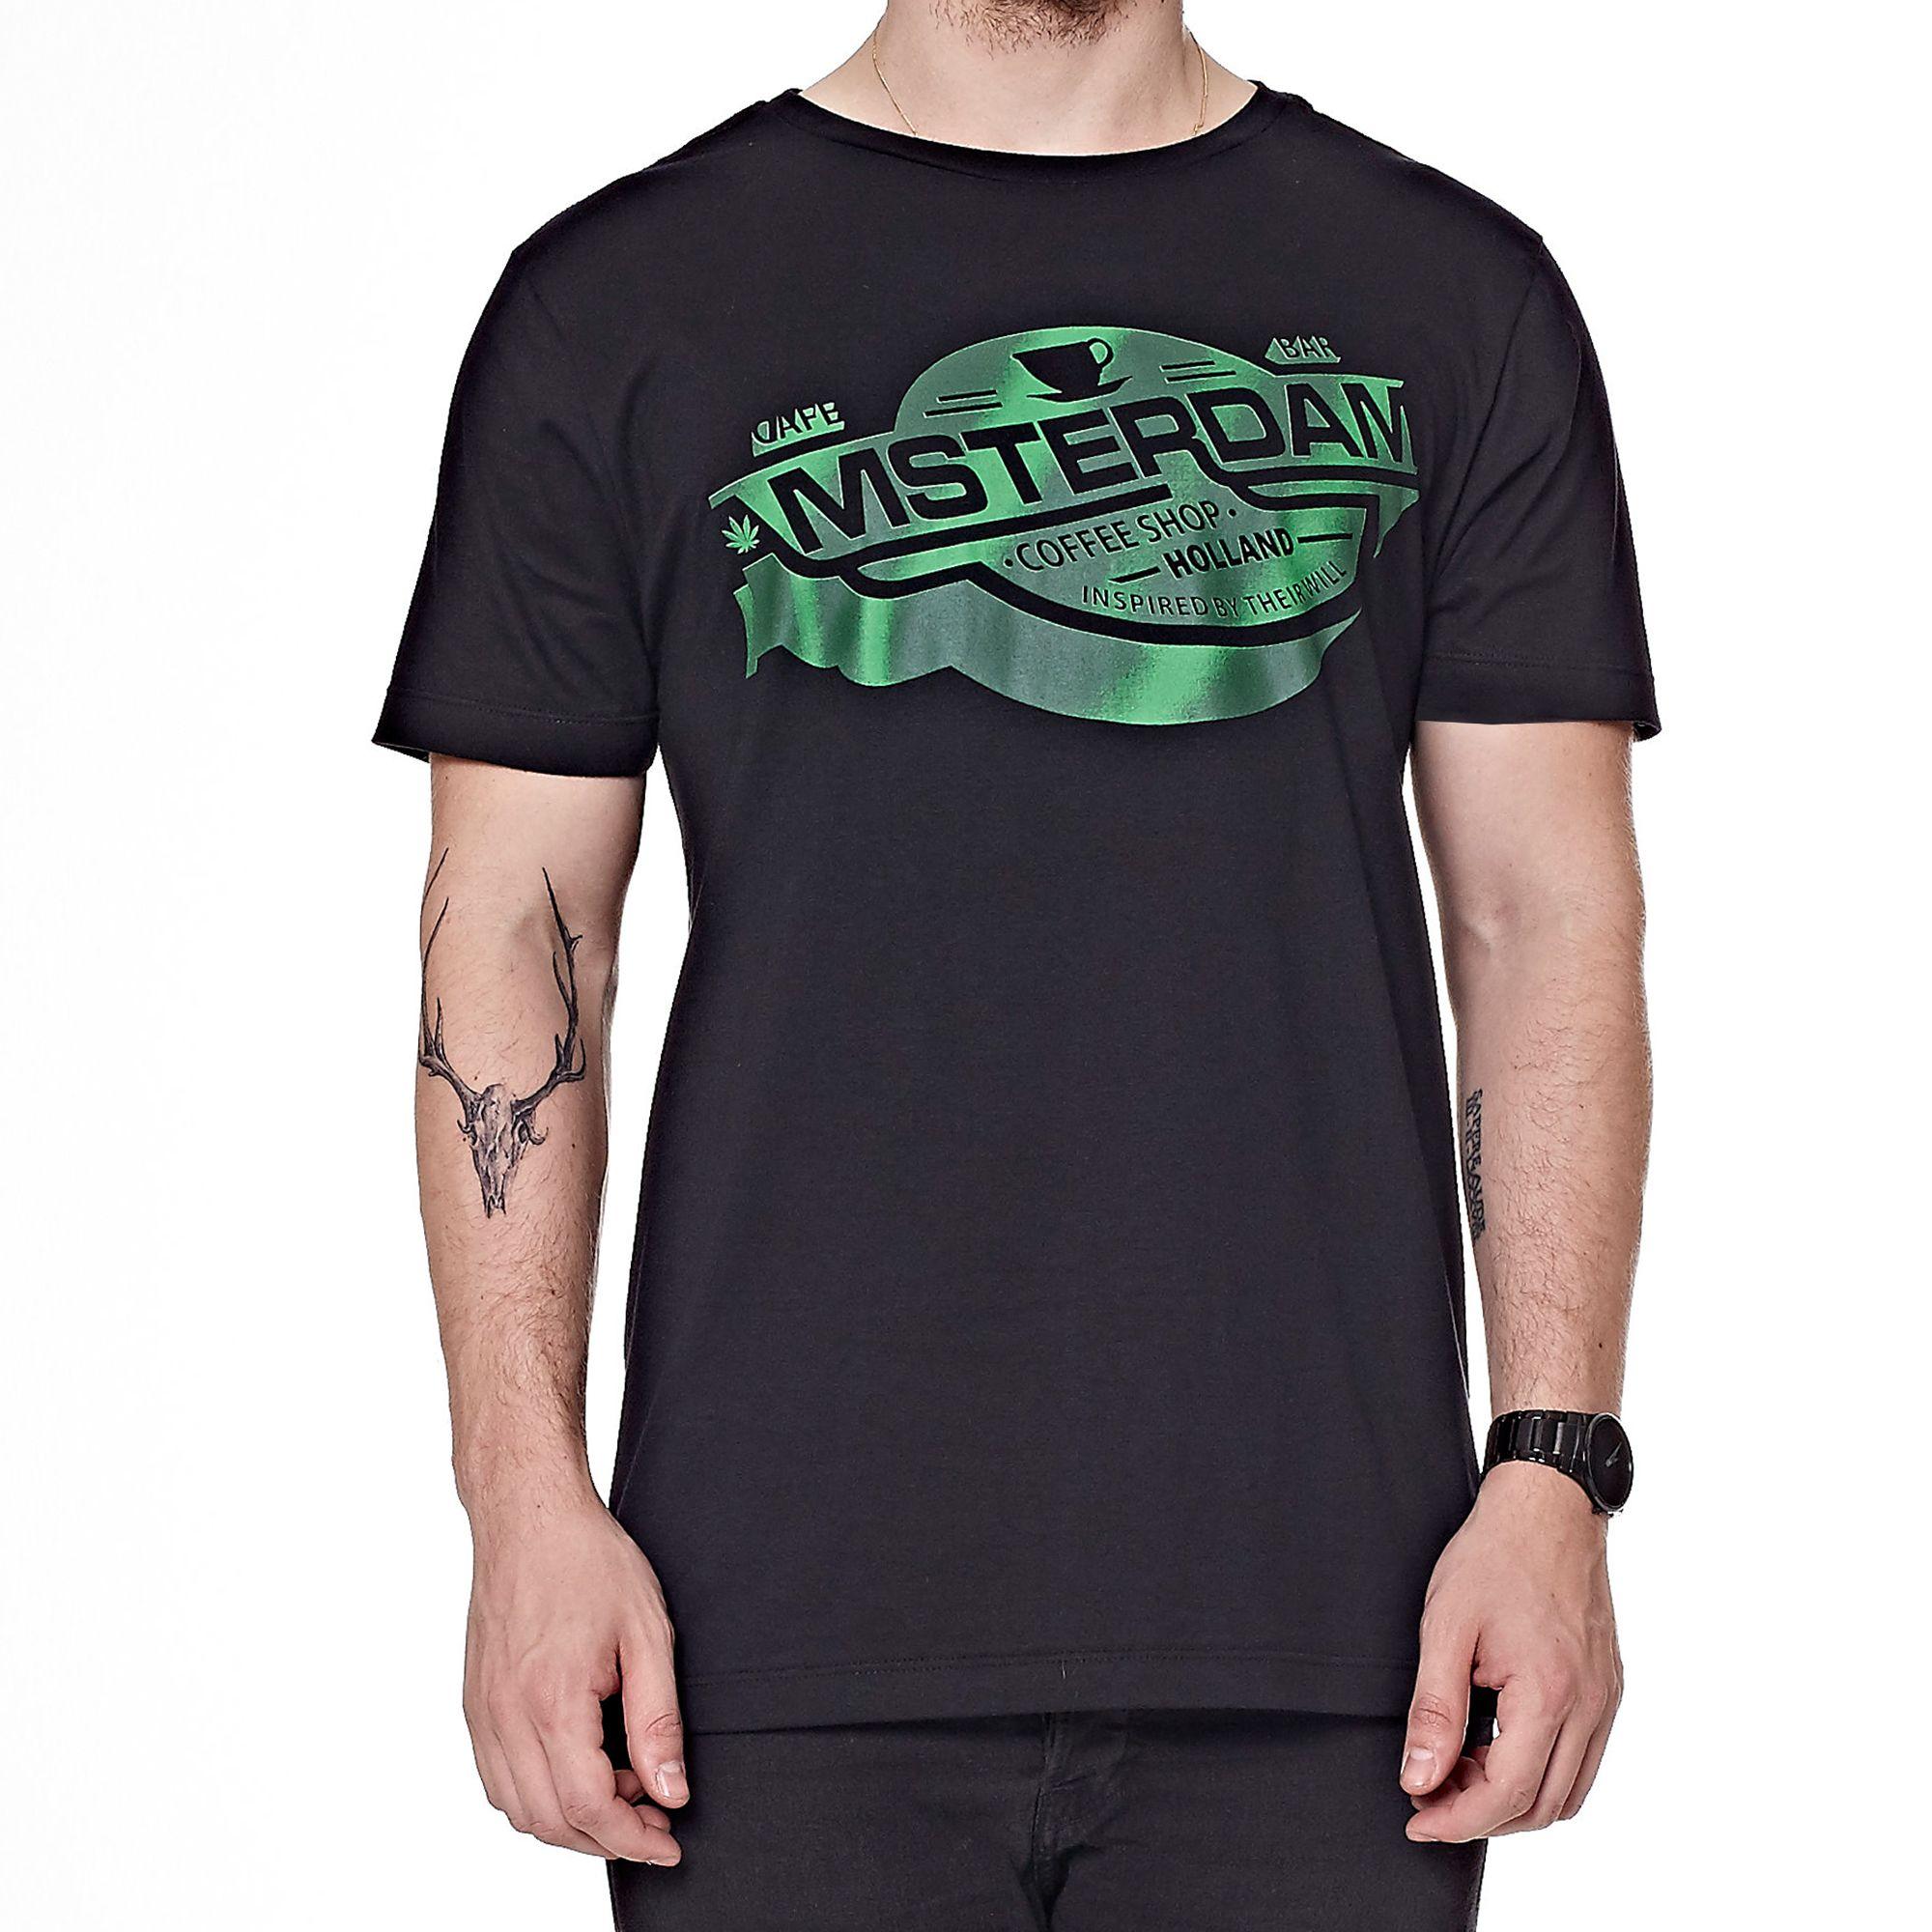 4c2edd1f33b0a Camiseta masculina Voort! Compre OnLine pela kanuibr    www.kanui.com.